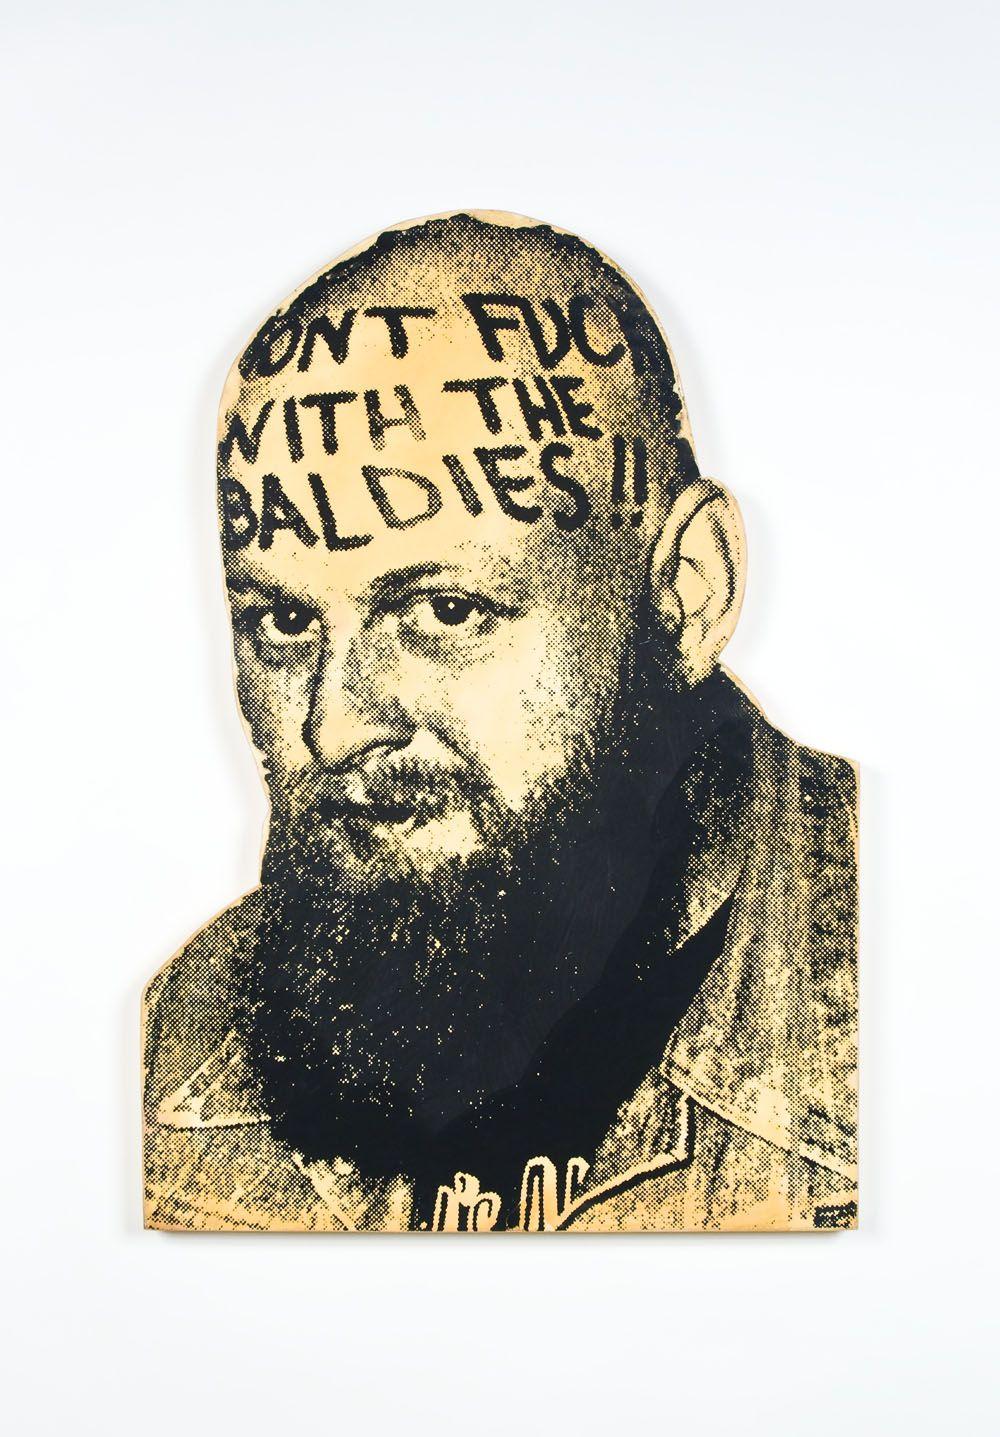 SKYLAR FEIN Don't Fuck With the Baldies, 2011